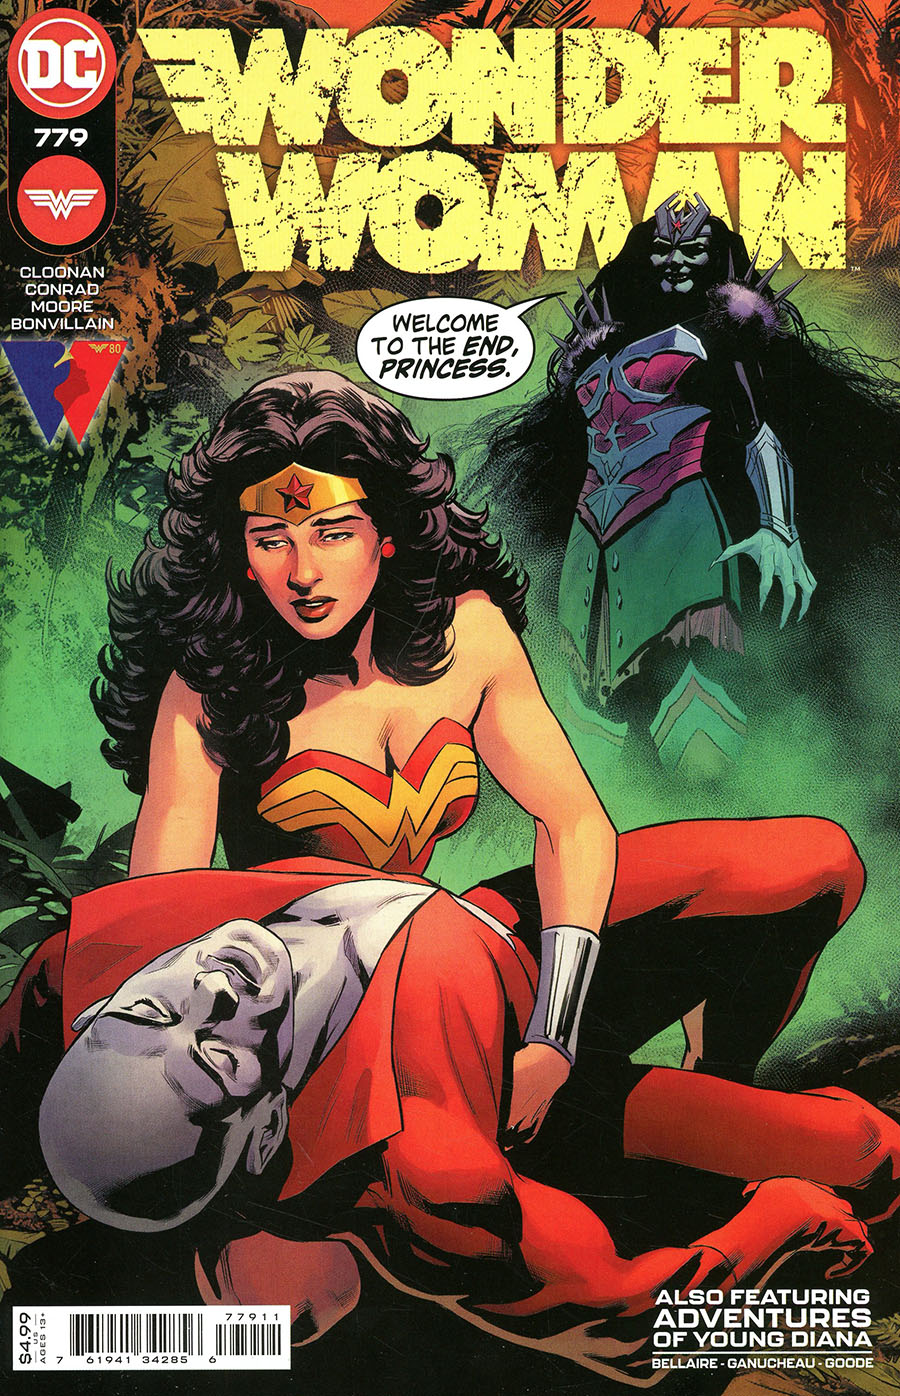 Wonder Woman Vol 5 #779 Cover A Regular Travis Moore & Paulina Ganucheau Cover